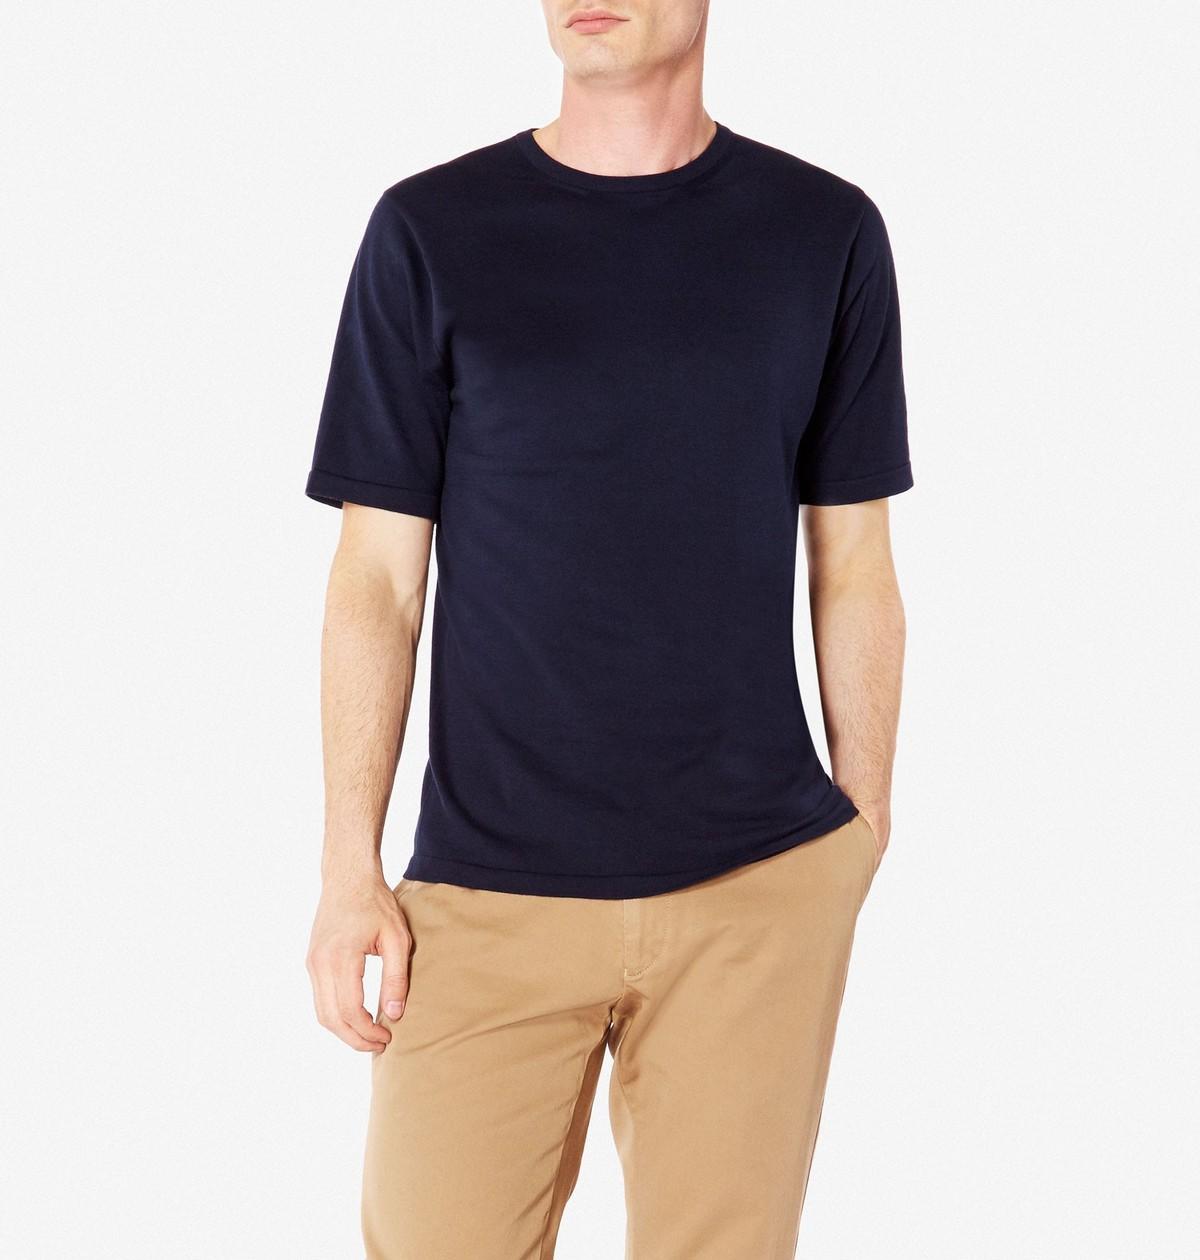 Sunspel Sea Island Cotton Knit T Shirt Garmentory